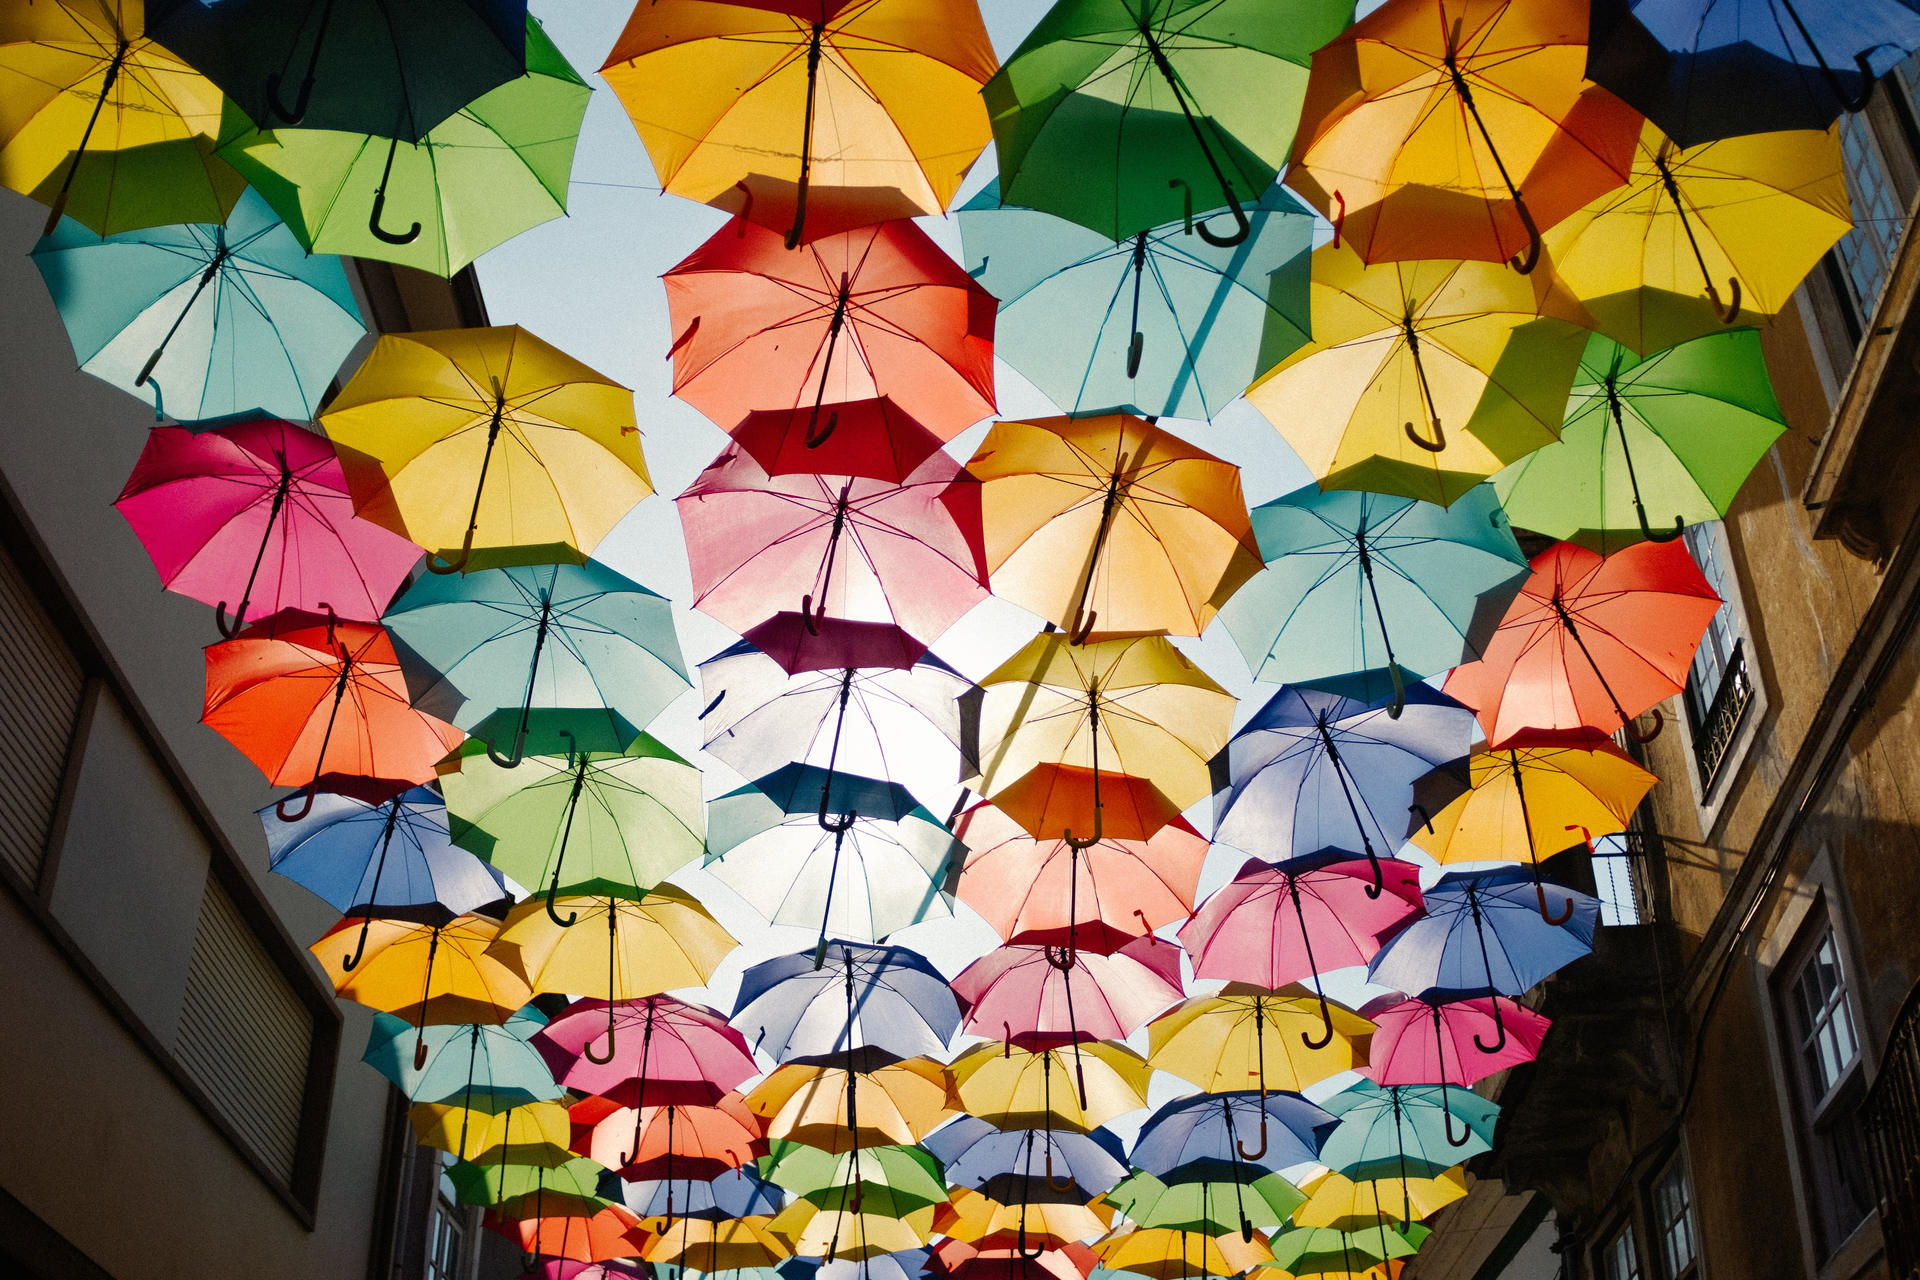 a group of umbrellas